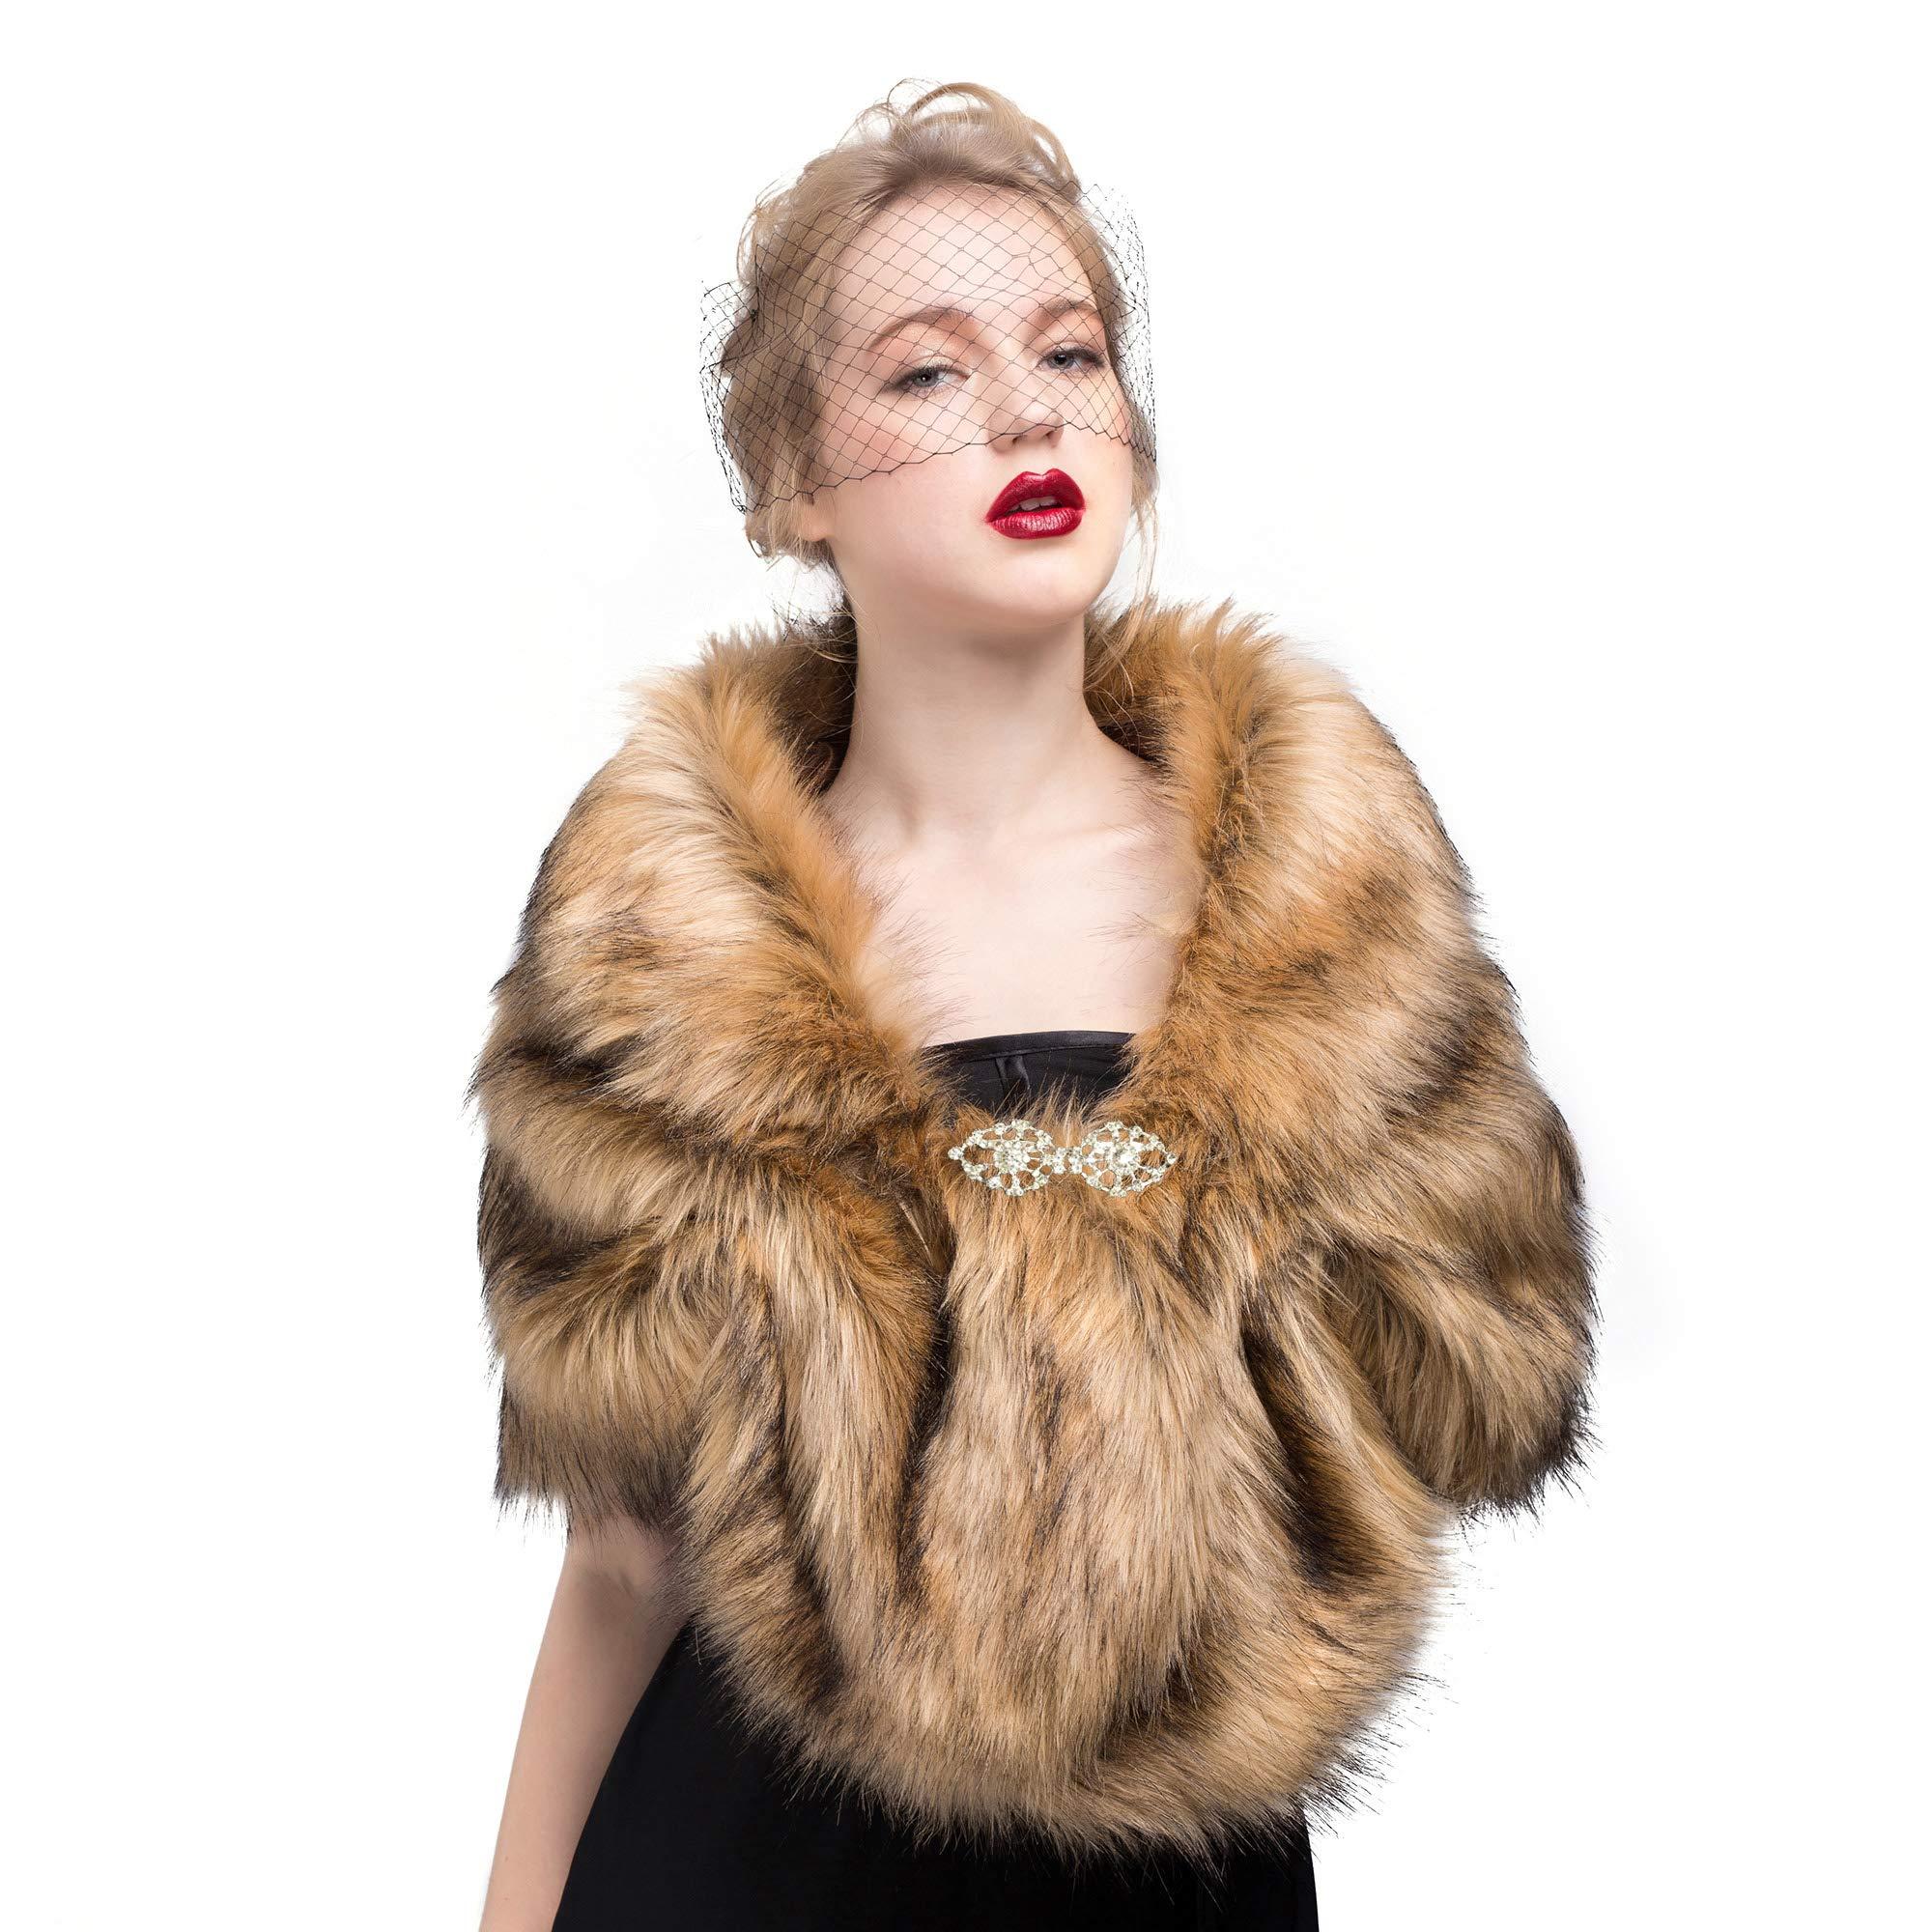 Faux Fur Shawl Wrap Stole Shrug Winter Bridal Wedding Cover Up FOX Fur Size L by BEAUTELICATE